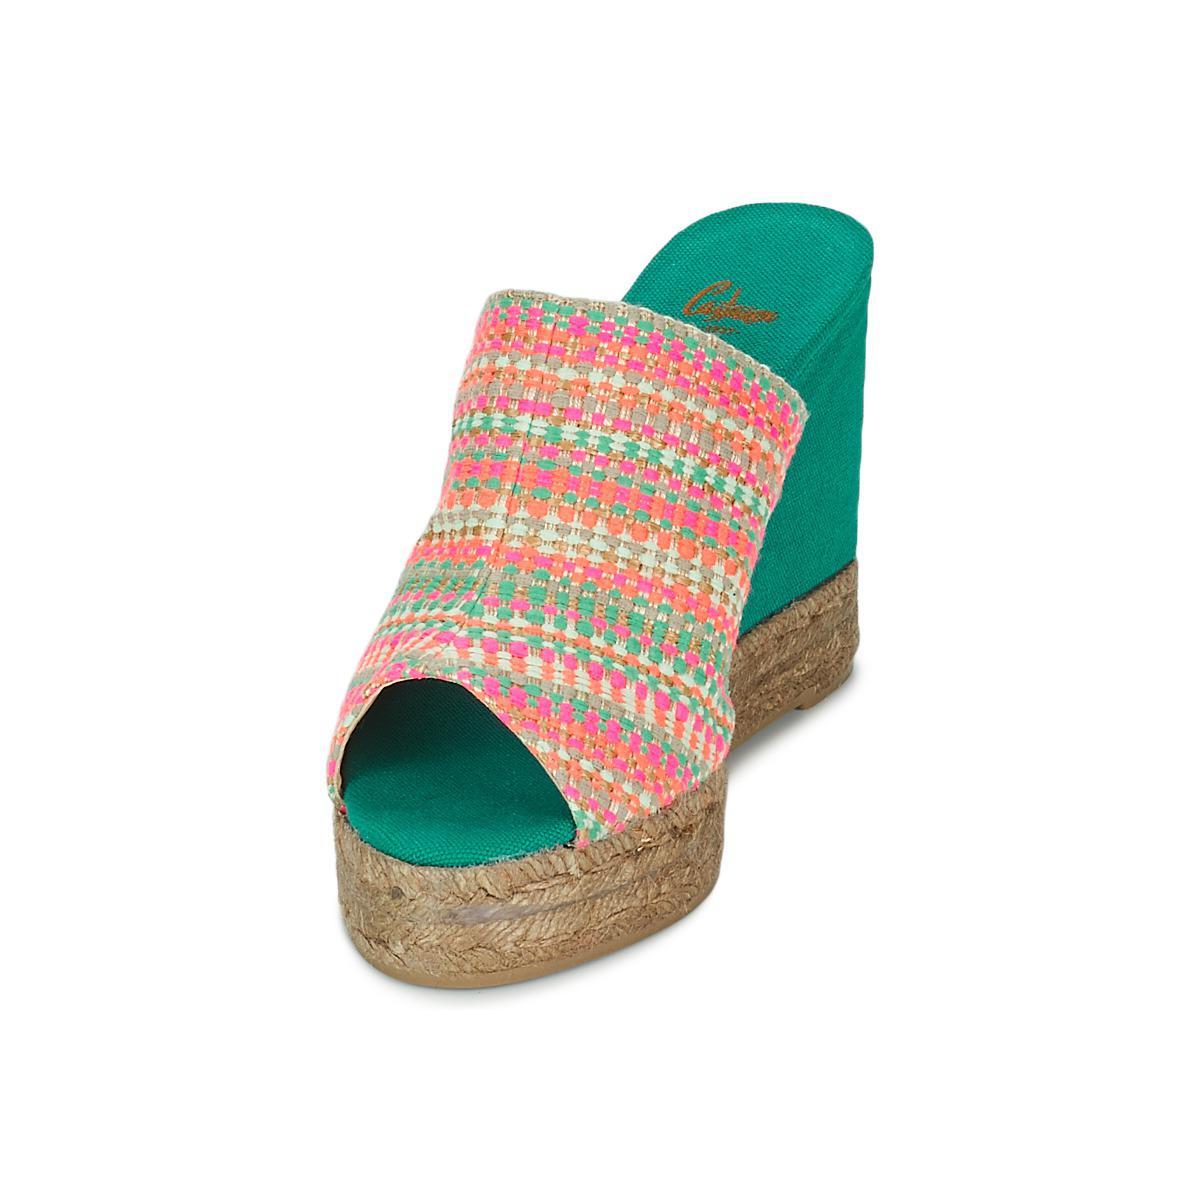 Castaner BUBU women's Mules / Casual Shoes in Manchester Sale Online Cheap Discount Authentic Cheap Visit Footlocker Finishline Cheap Sale Best Sale uwZ08OusFU